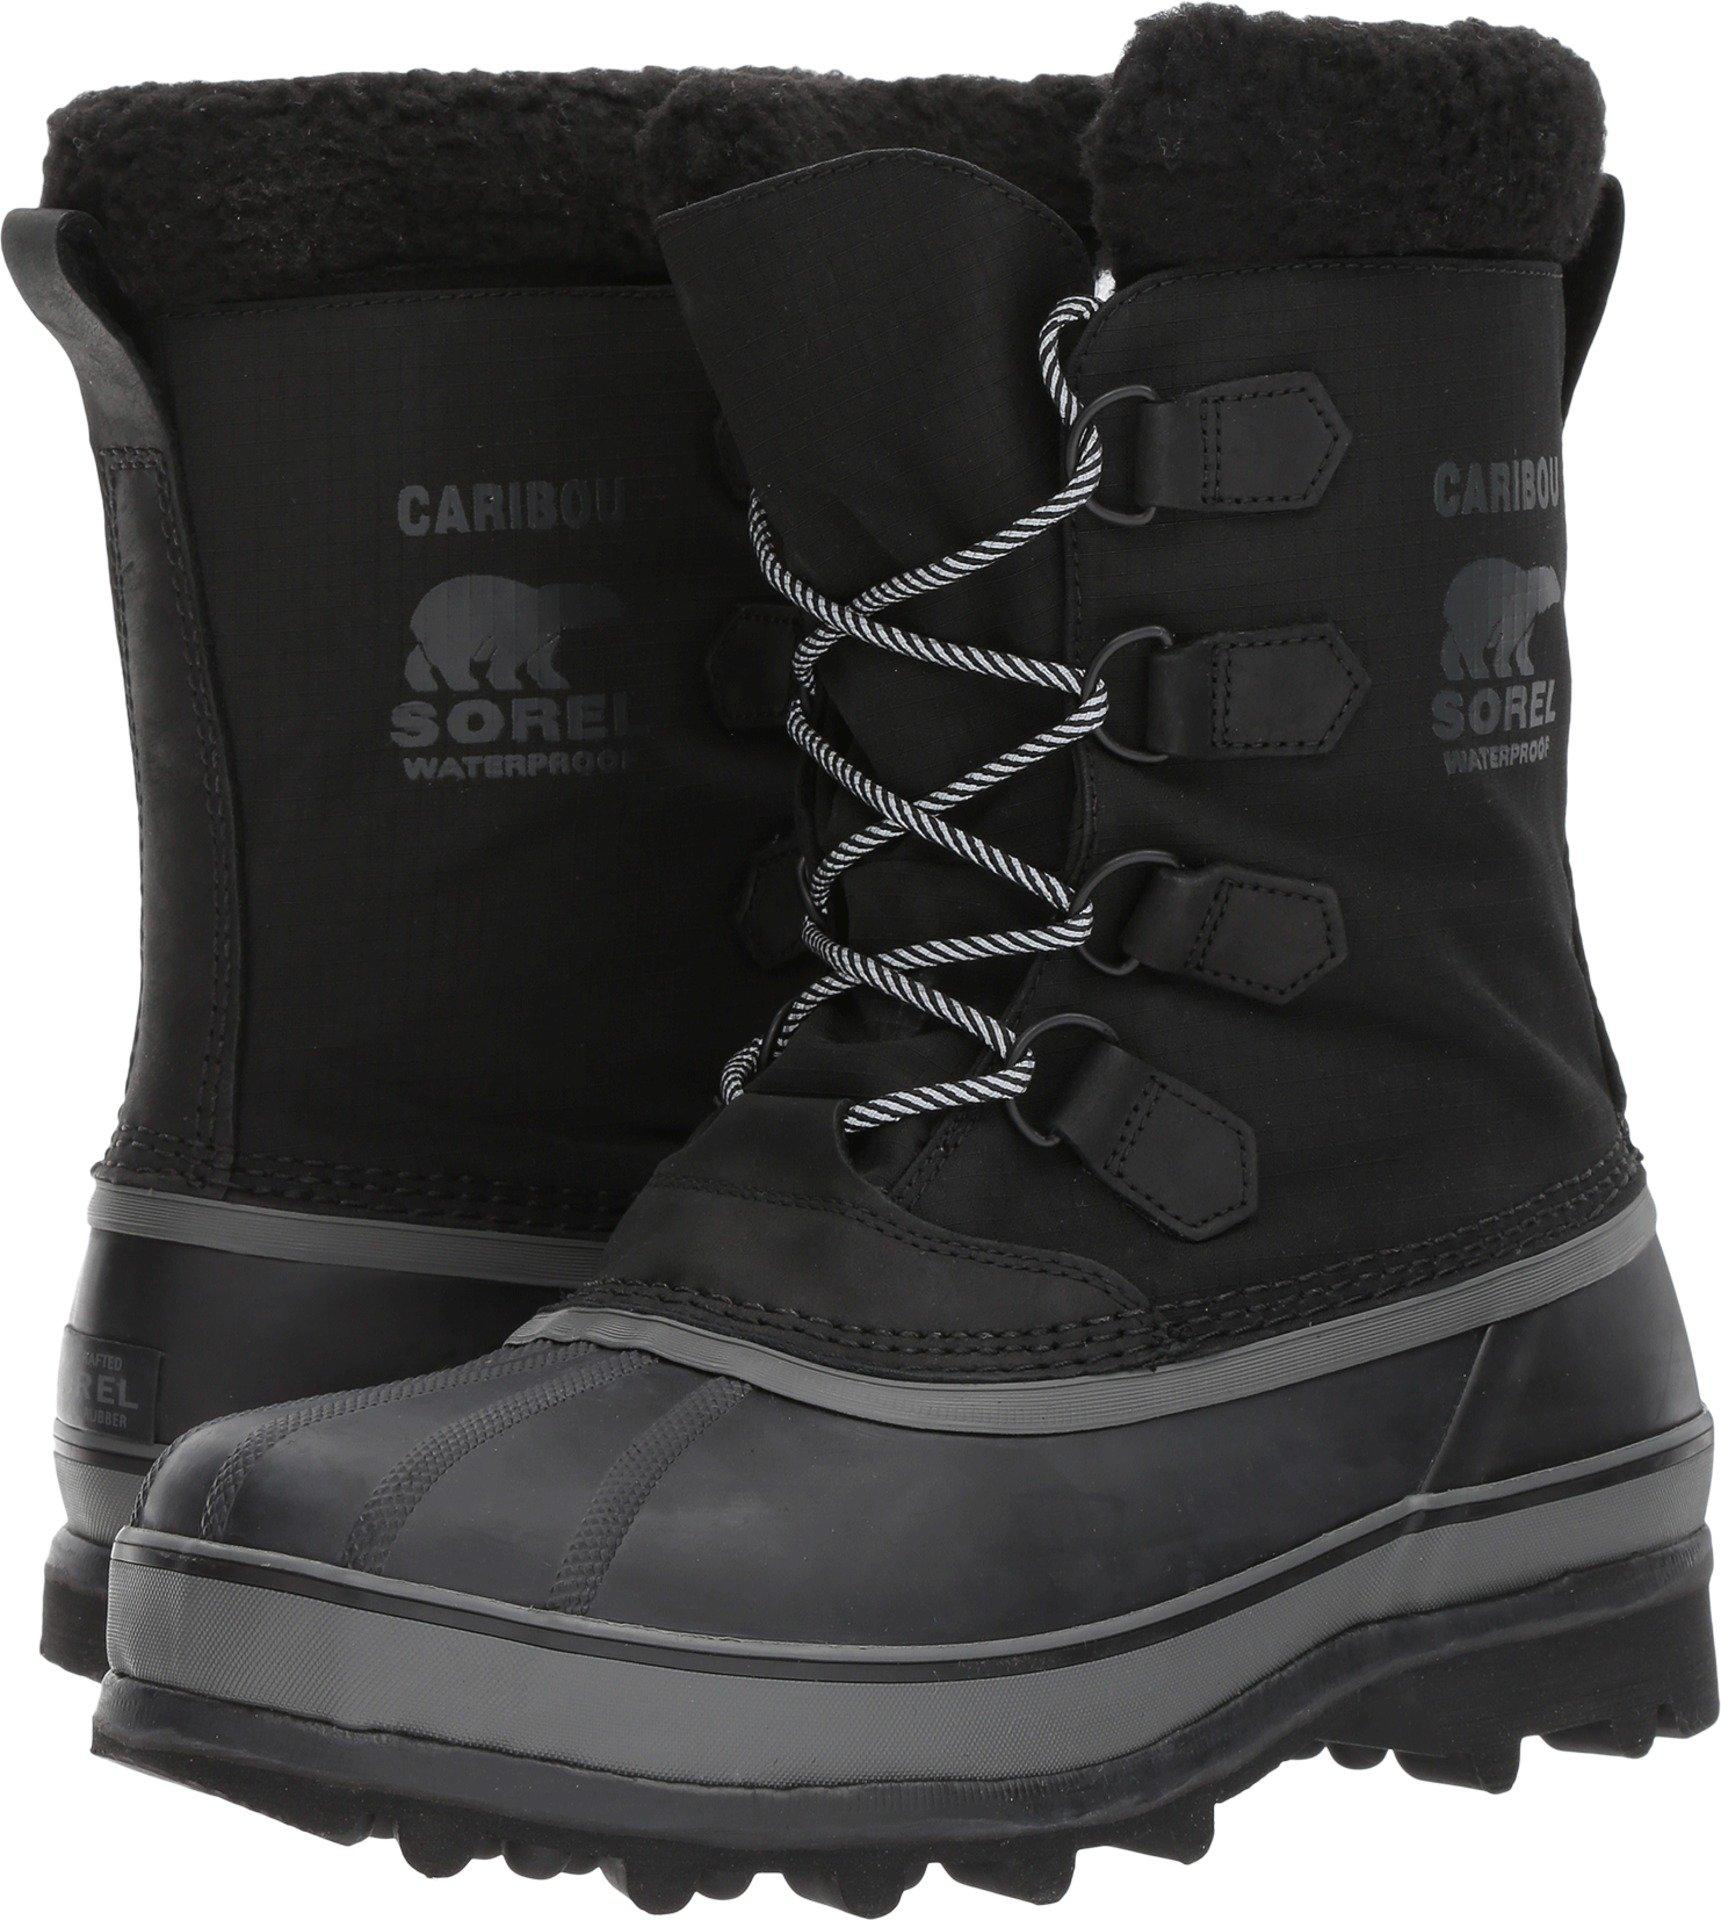 Sorel Men's Caribou Reflective WL Boots, Black, 12 D(M) US